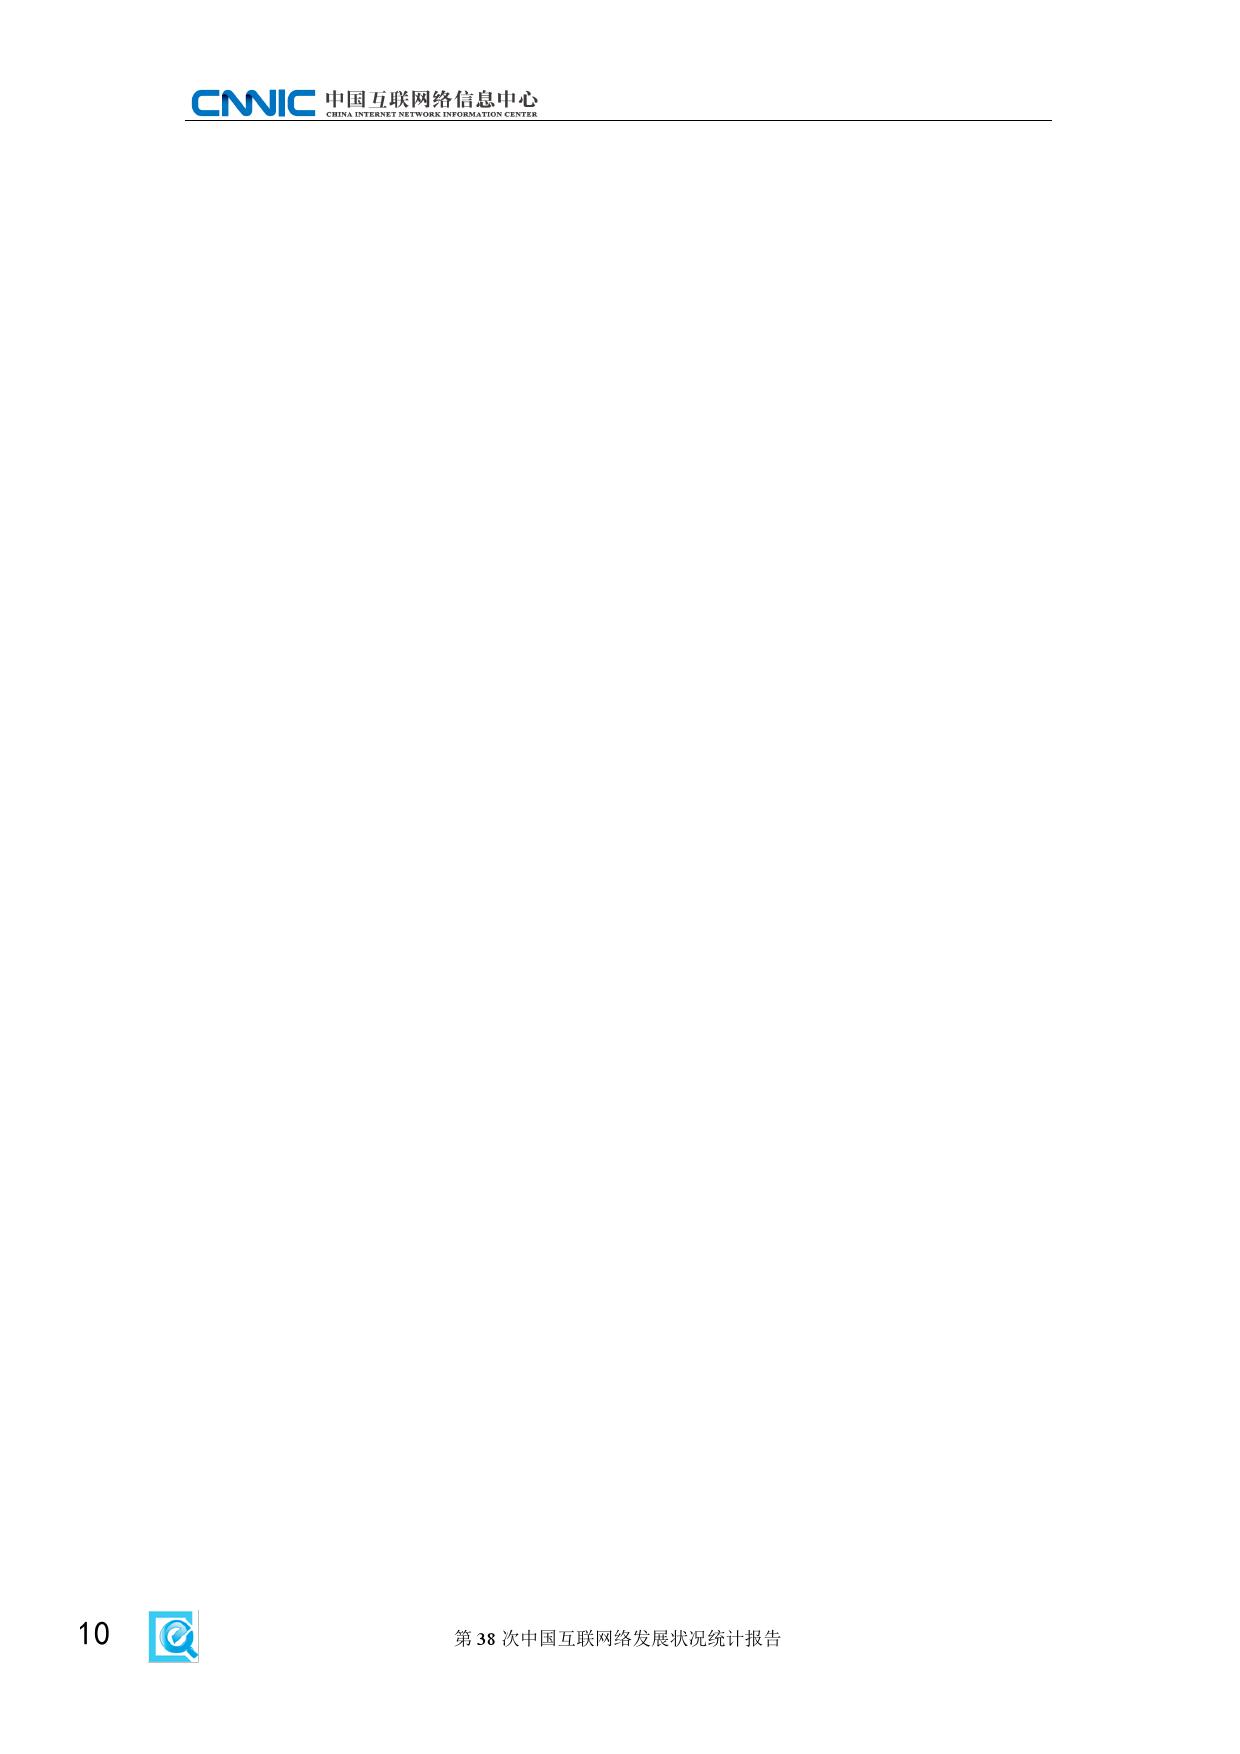 CNNIC:2015年第38次中国互联网络发展状况统计报告_000016